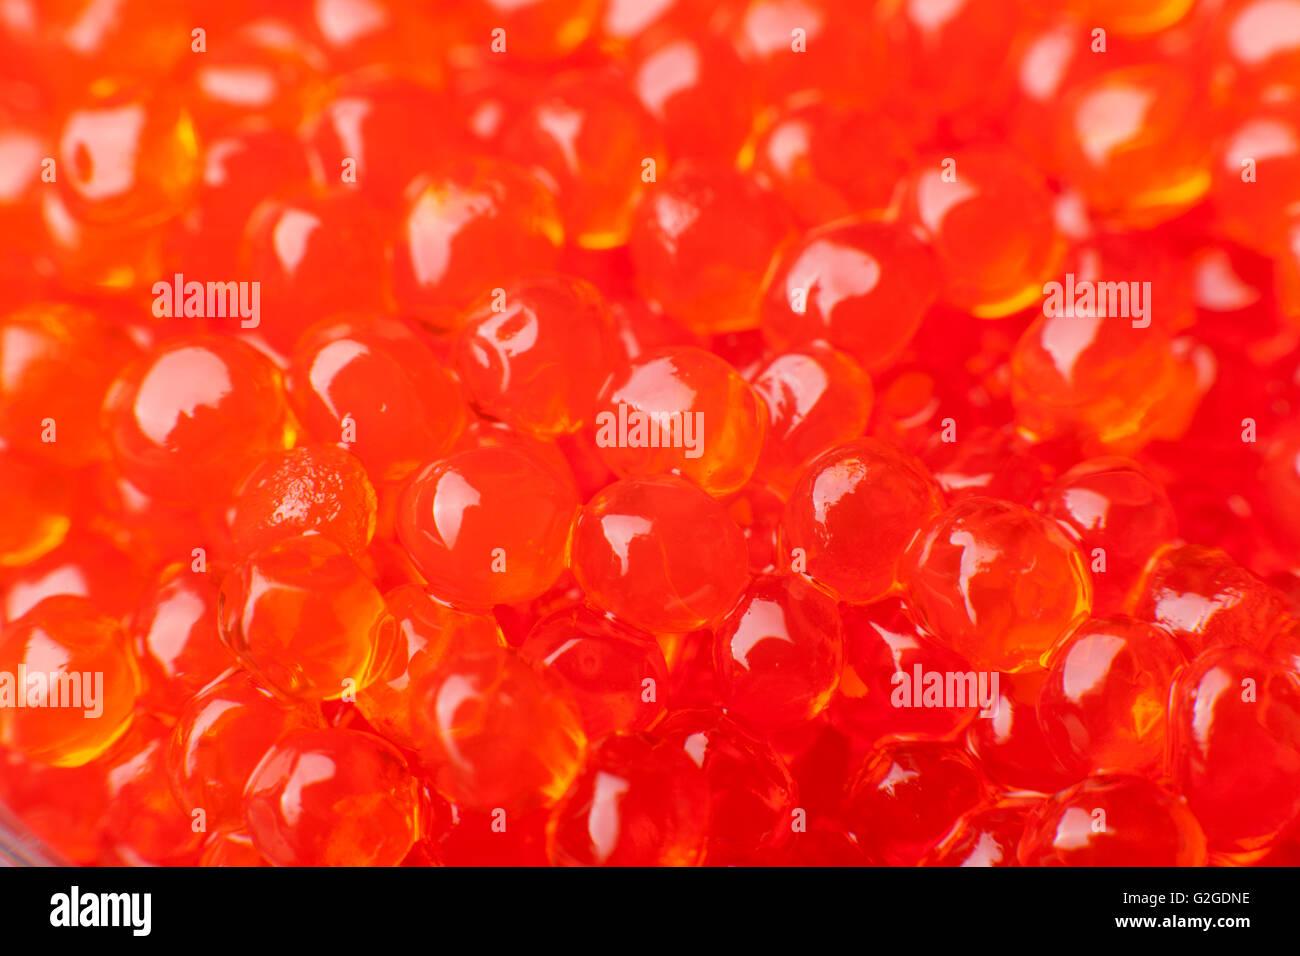 red caviar close-up macro shiny beads - Stock Image